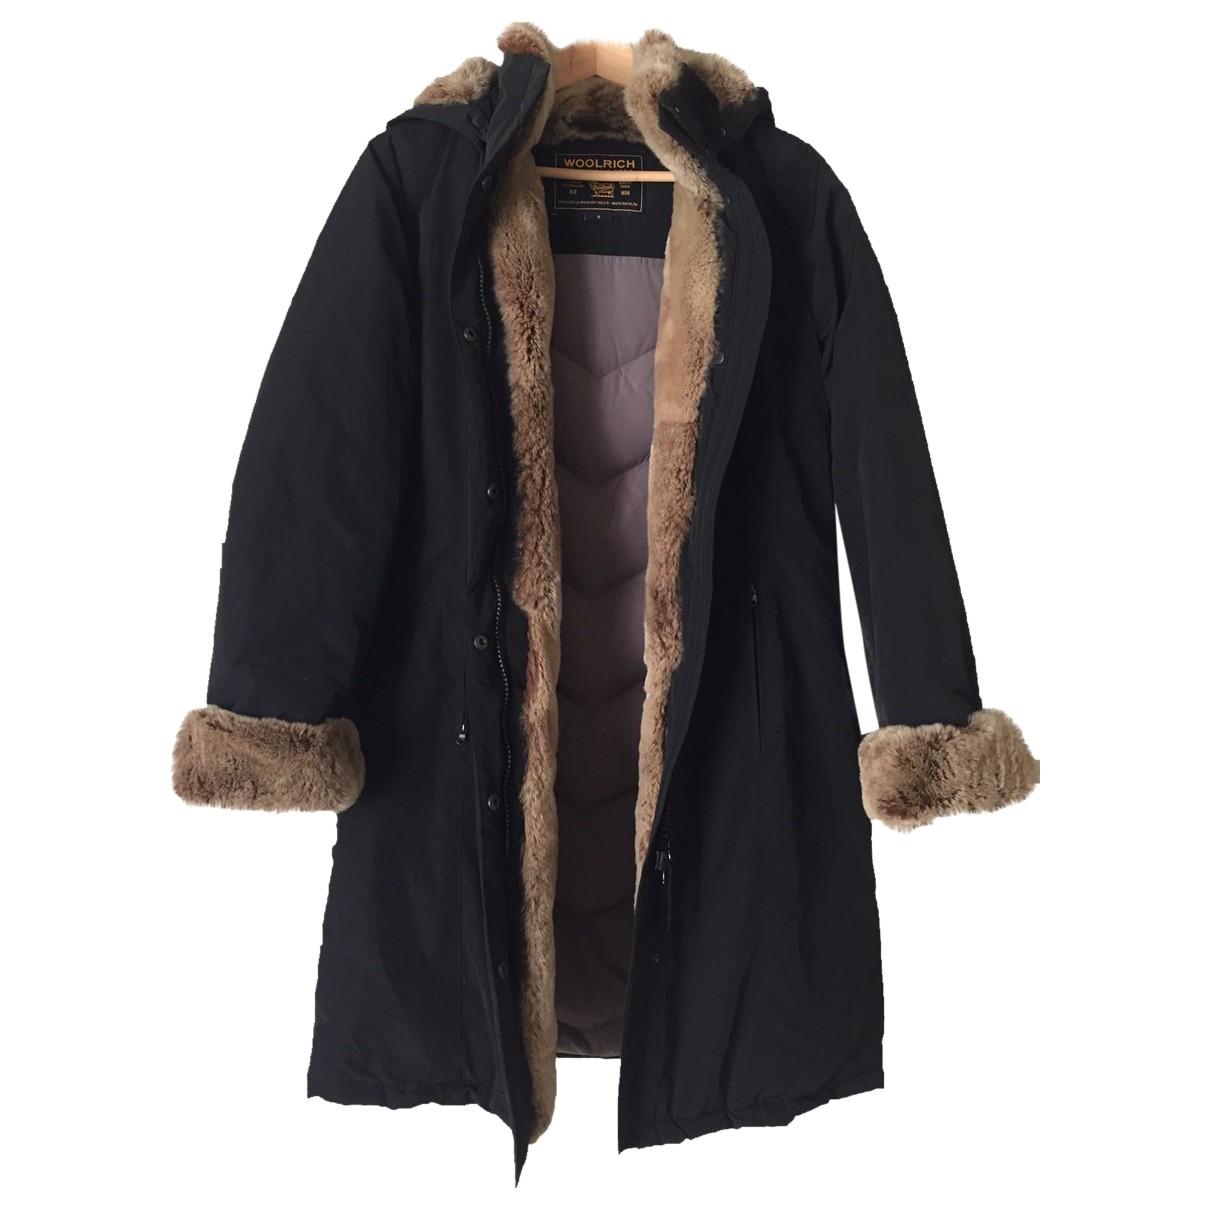 Woolrich \N Maentel in  Schwarz Polyester